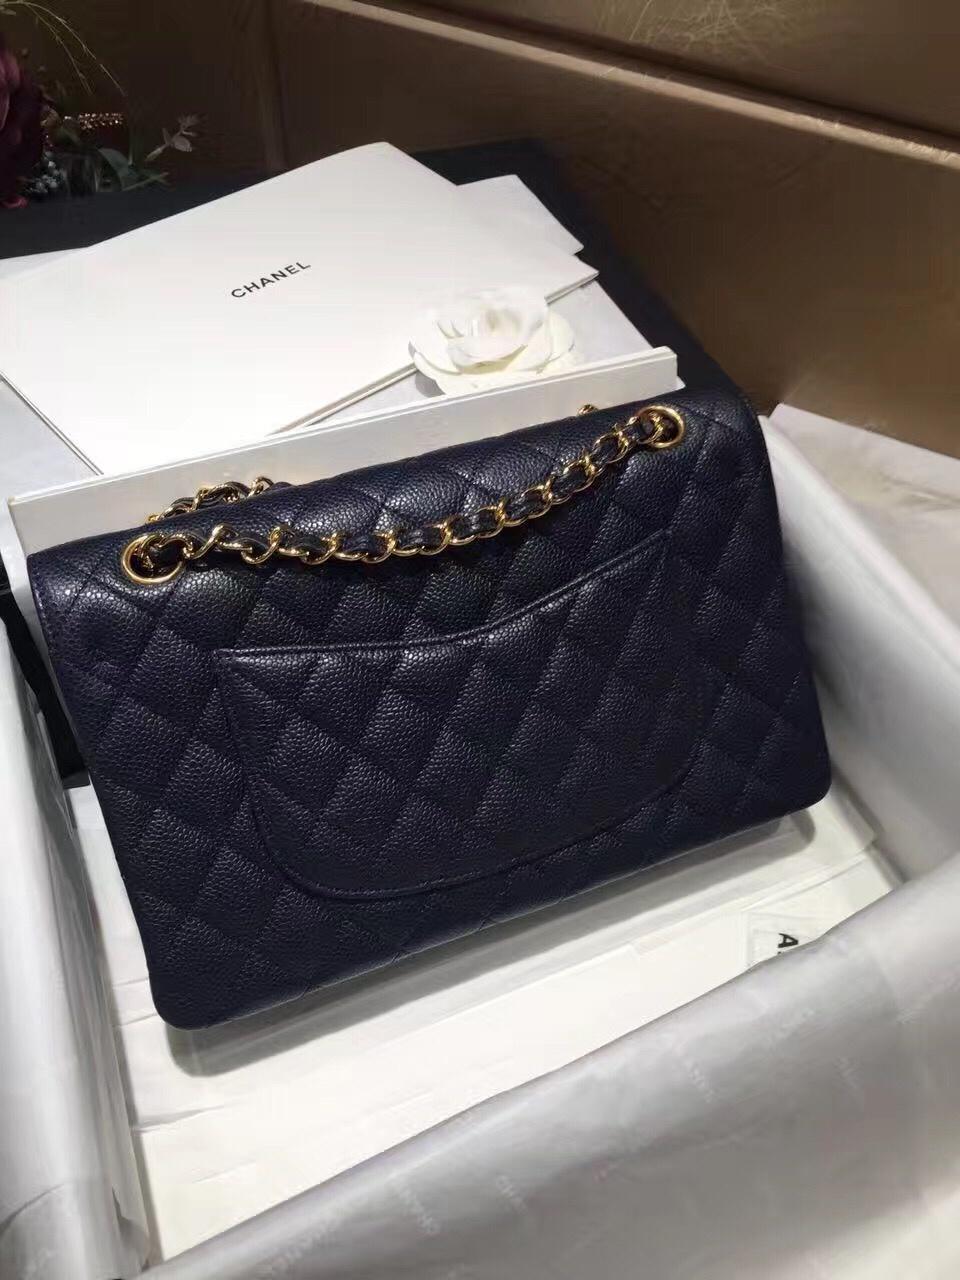 Chanel 香奈儿 Classic Flap 代购版本 25cm 进口鱼籽酱 海军蓝 金扣